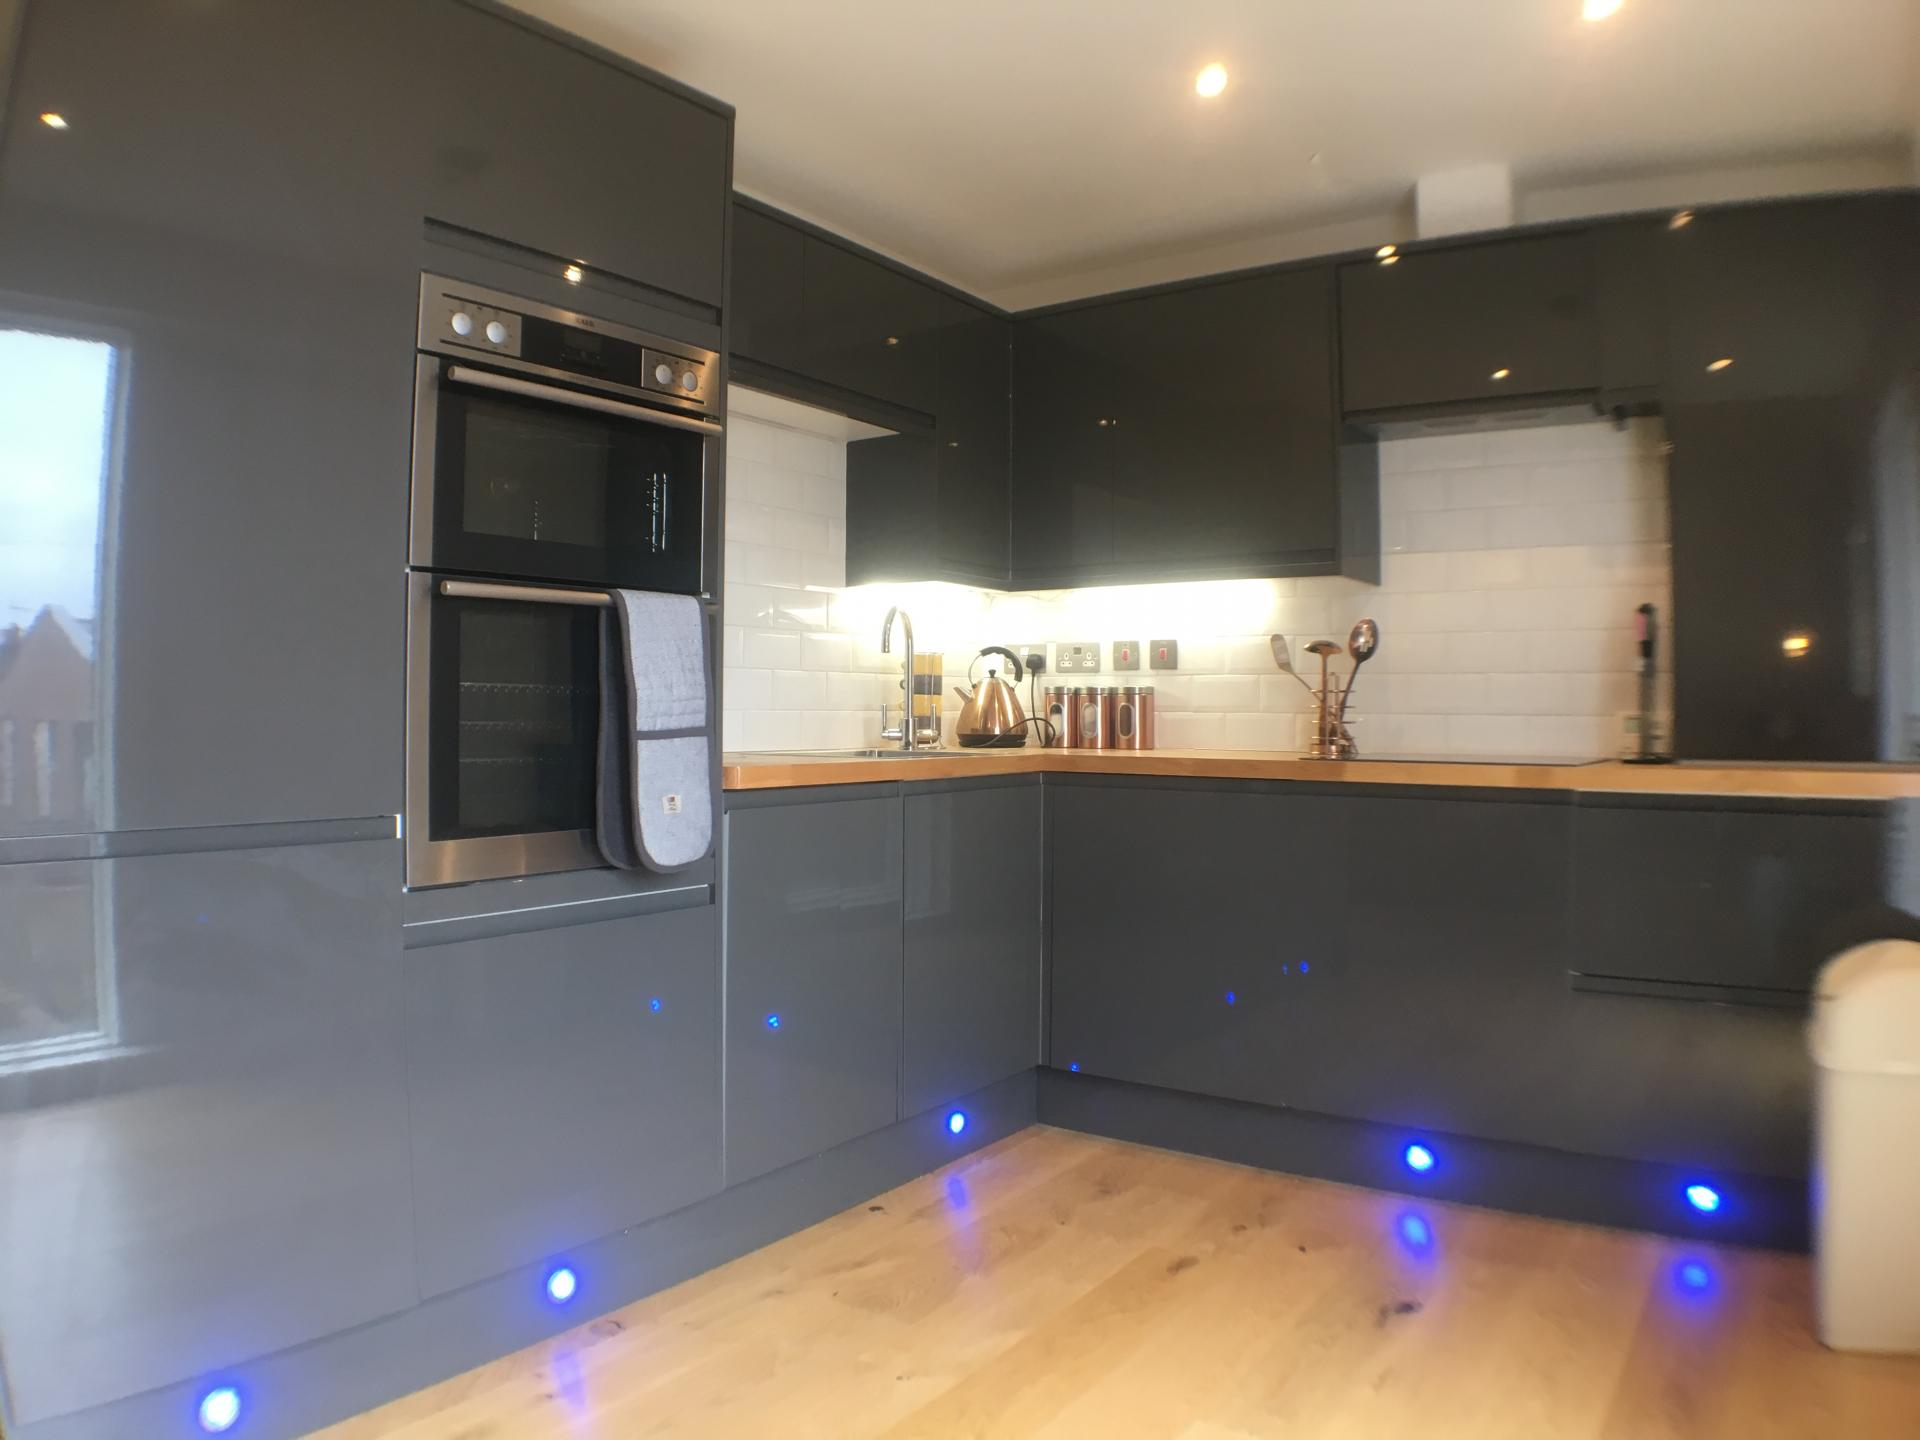 Kitchen at Sweet Briar Mews Apartment, Centre, St Albans